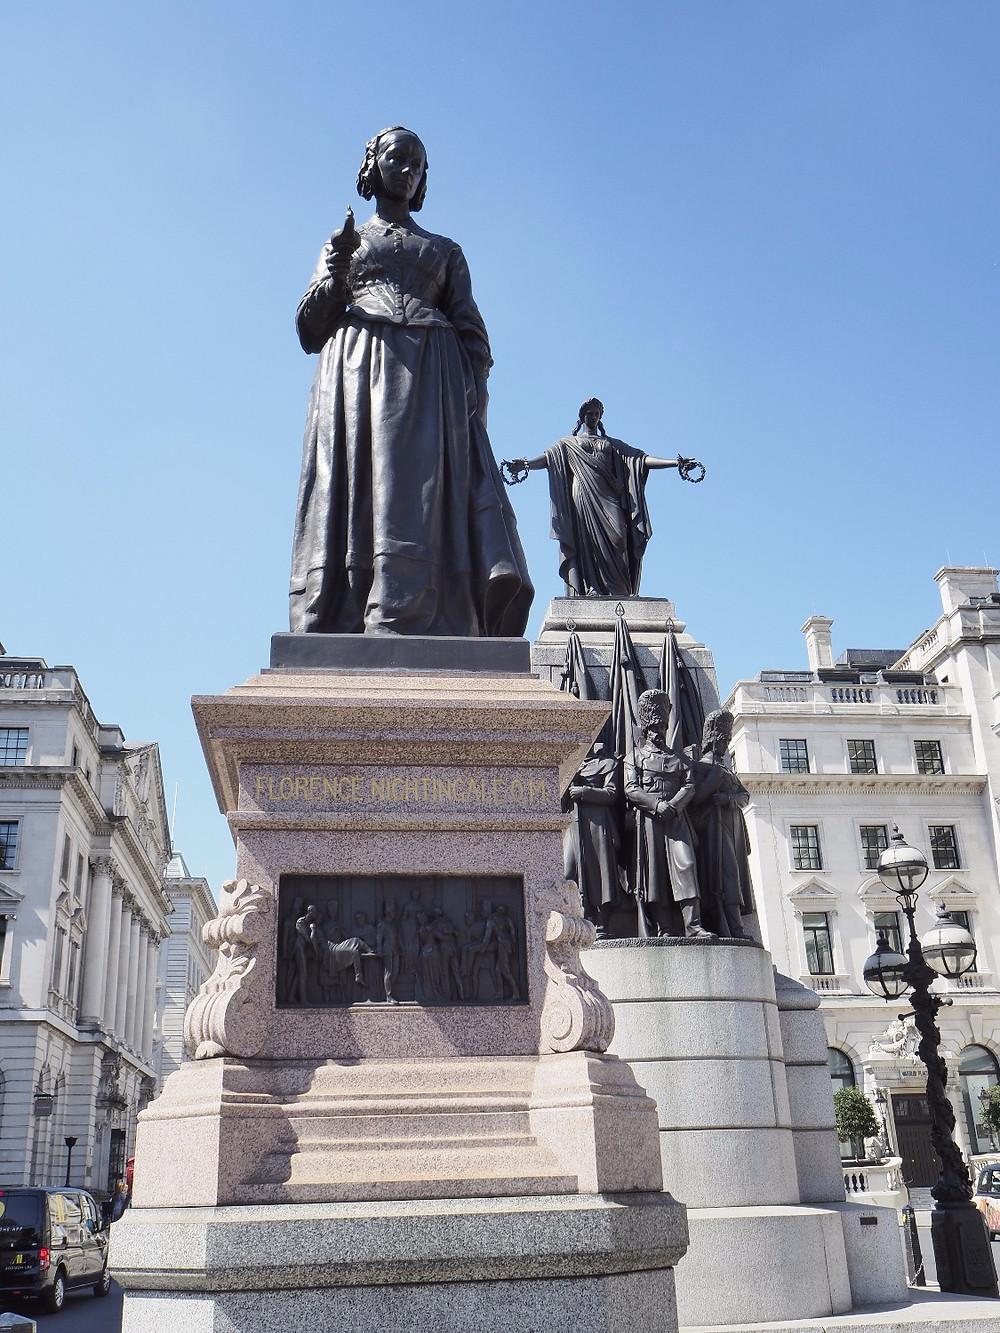 Florence Nightingale and The Crimea